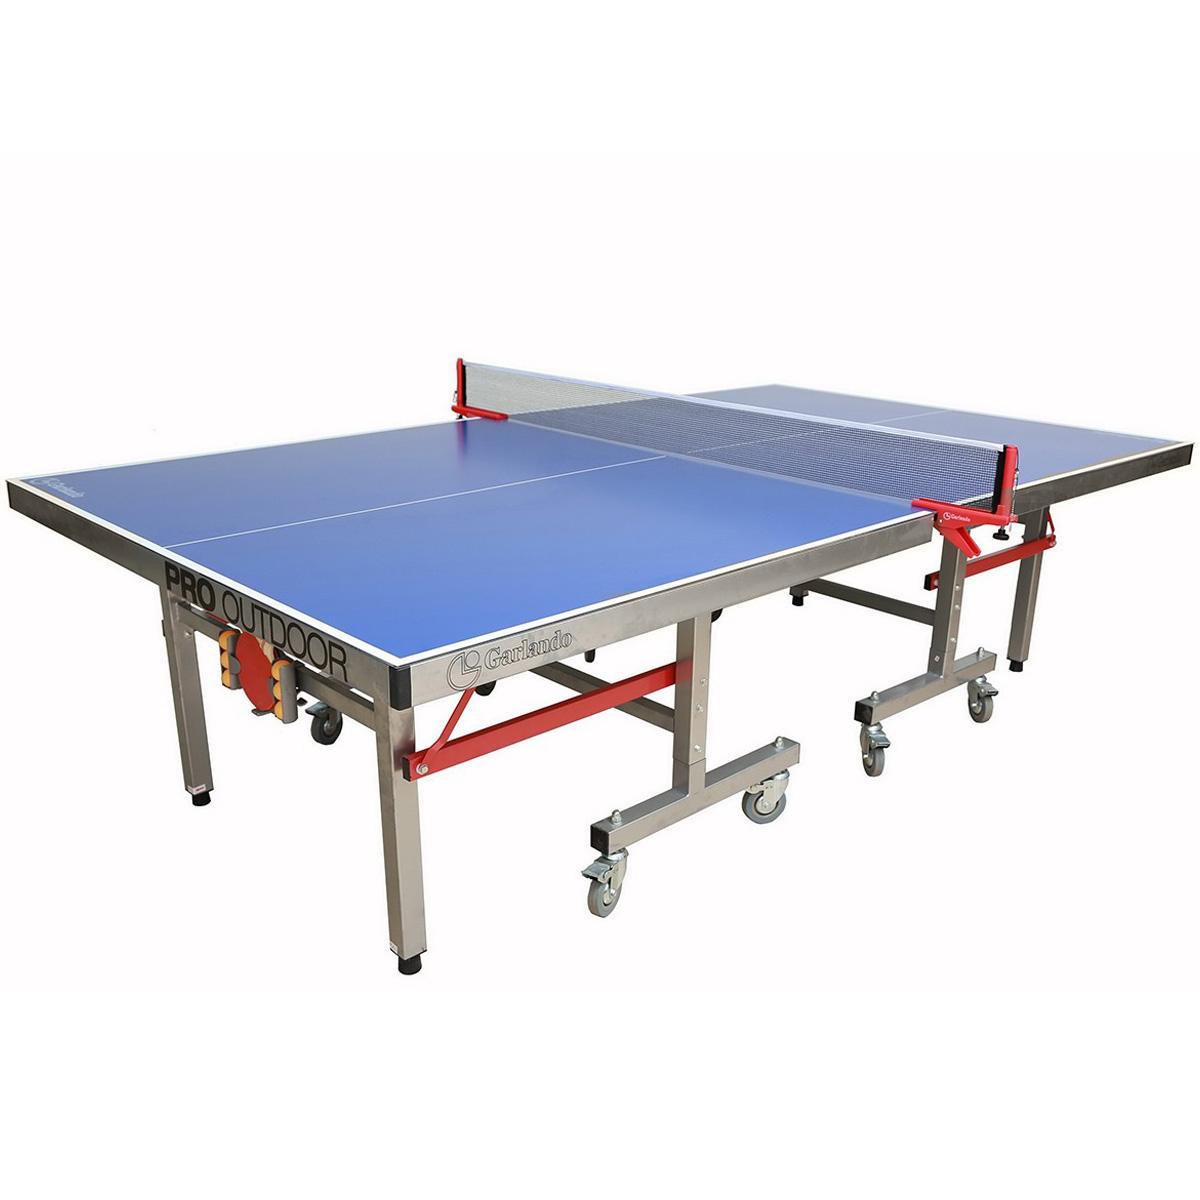 Garlando pro outdoor table hollywood billiards - Weatherproof table tennis table ...